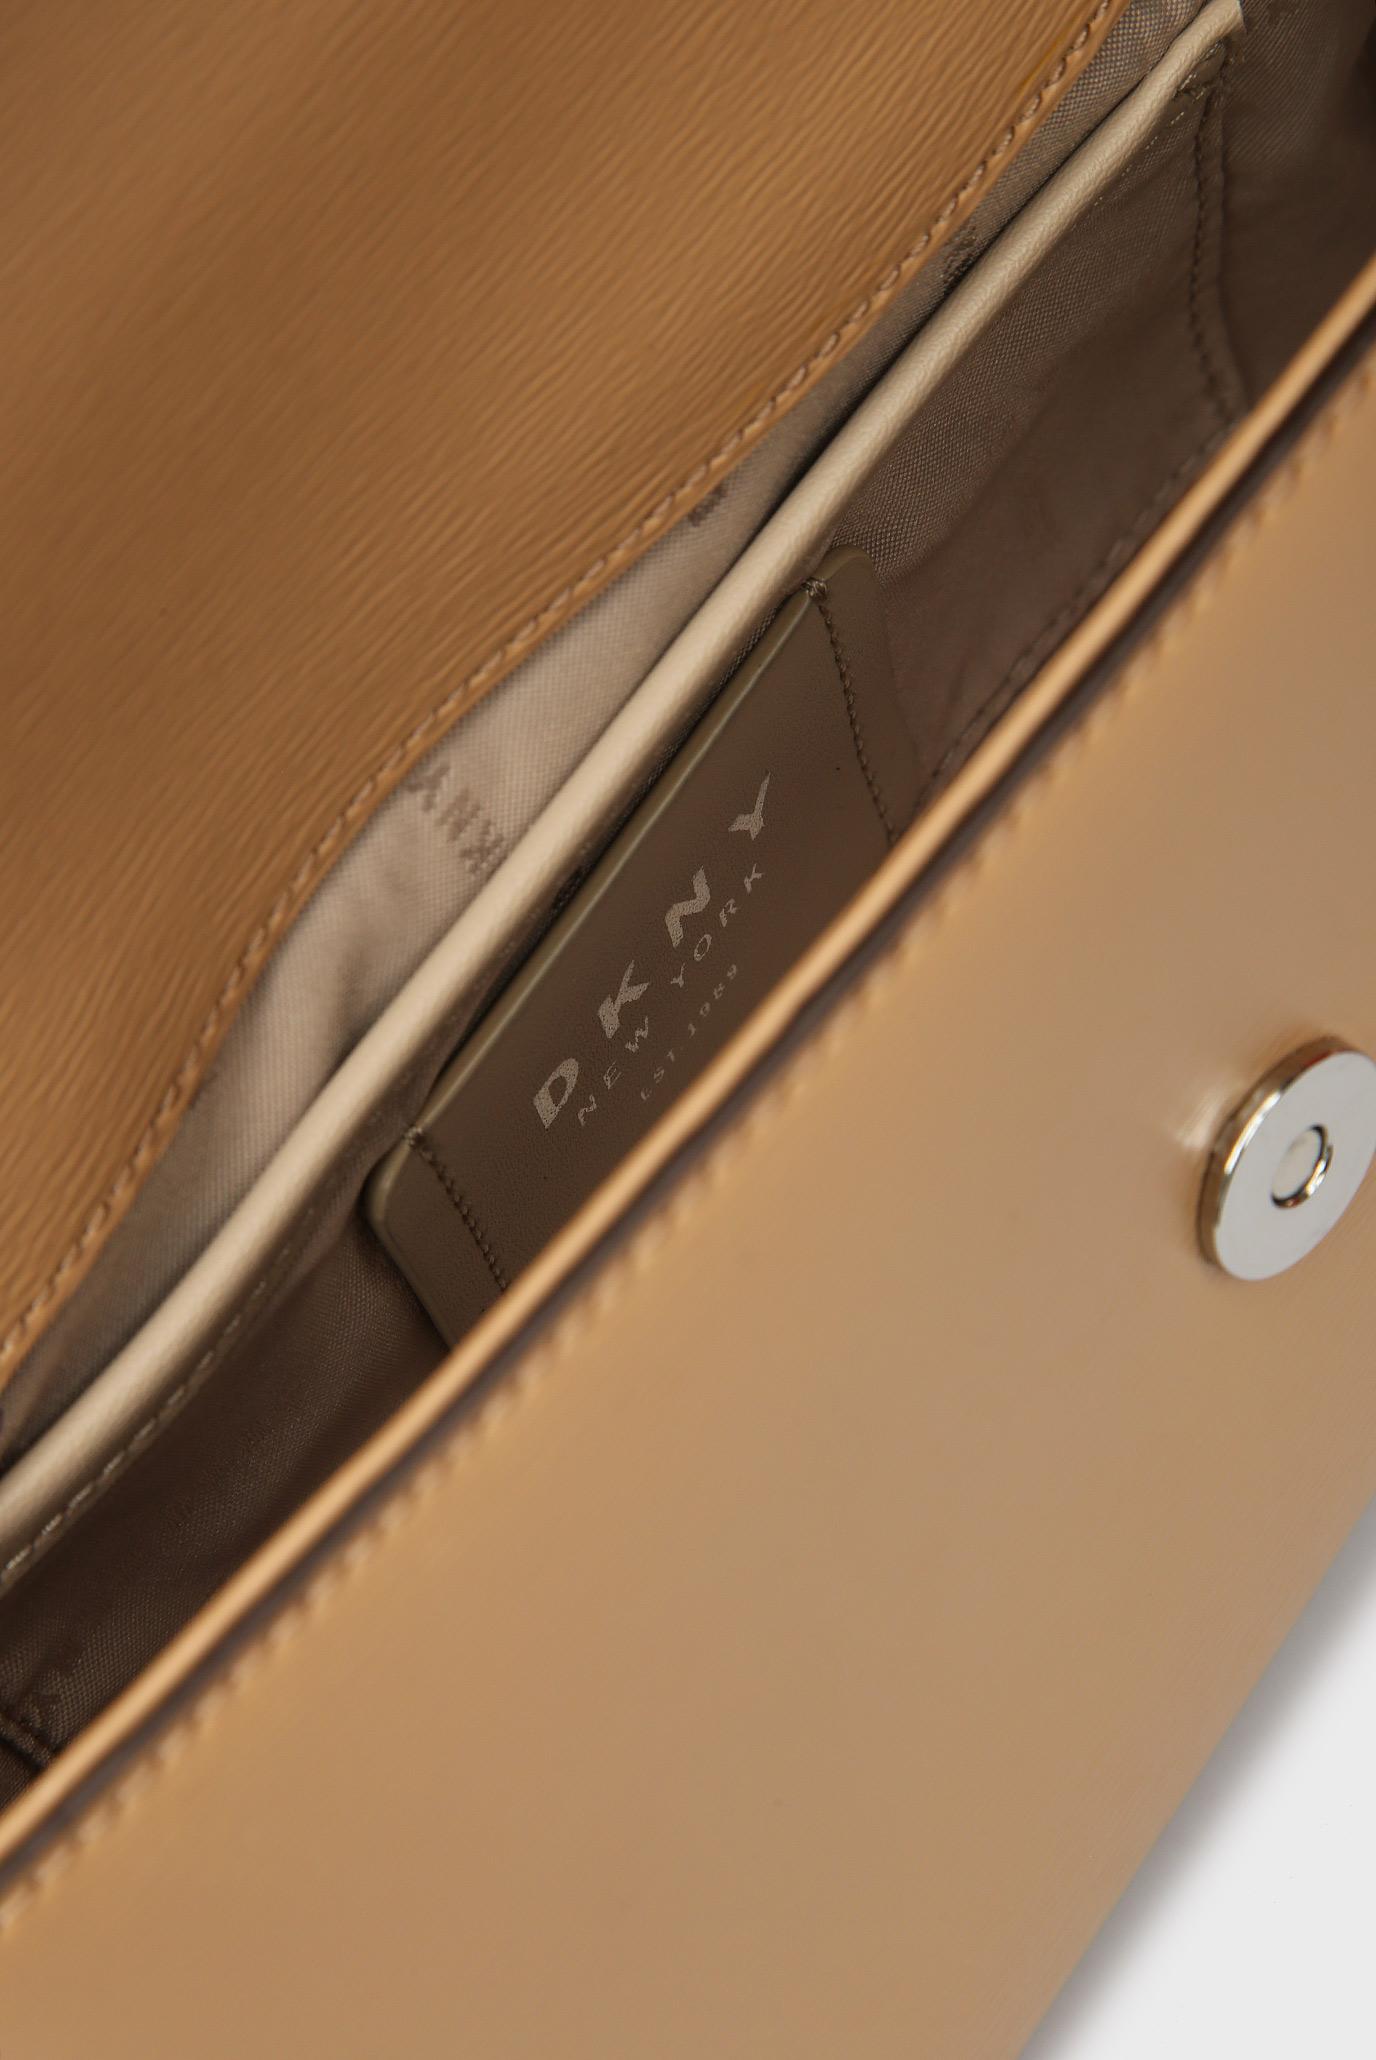 f56c006be670 Купить Женская бежевая сумка через плечо BRYANT-MD DKNY DKNY R82E3467 – Киев,  Украина. Цены в интернет ...